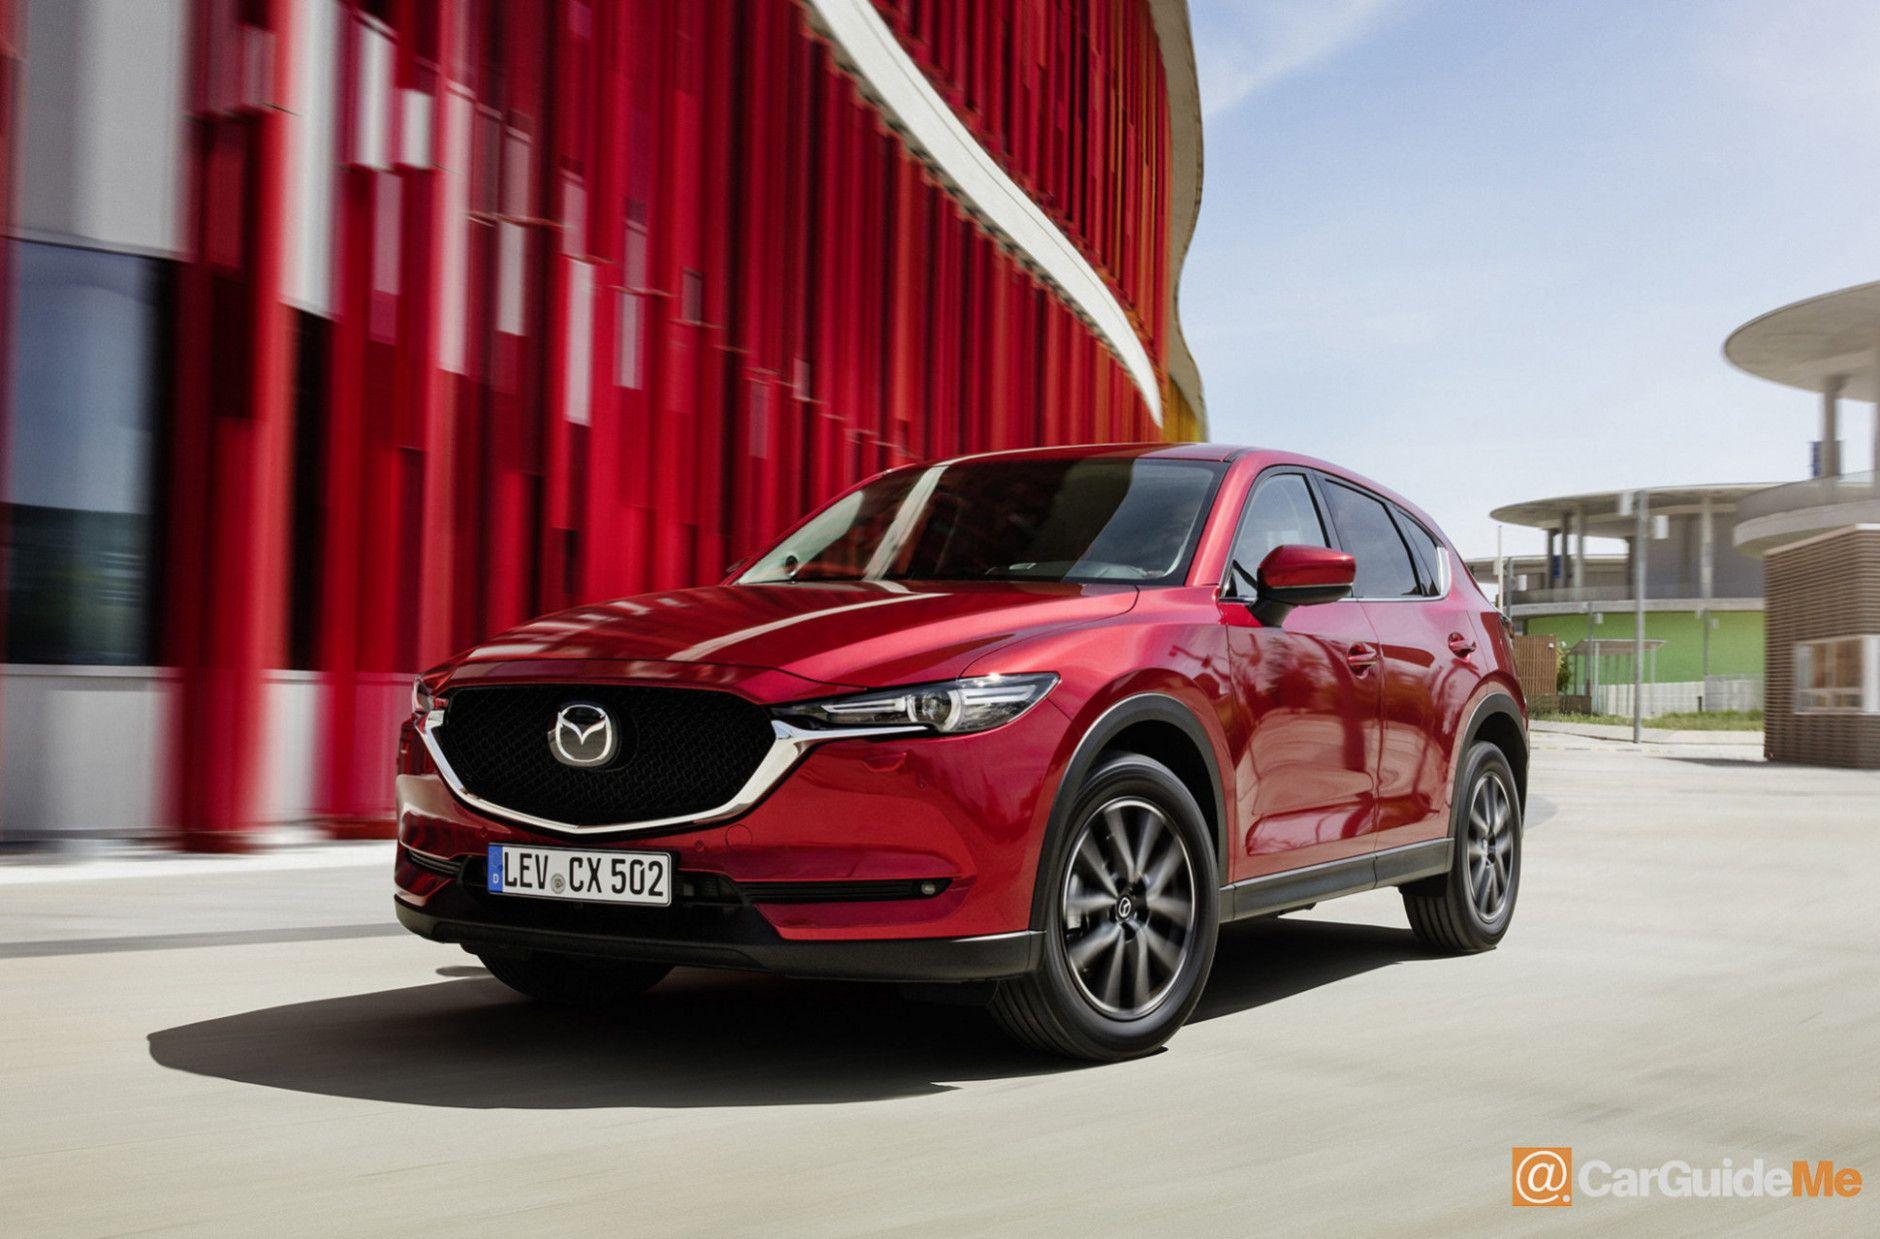 Mazda 4 Oman Pictures 4 Car Reviews Mazda 2020 Oman